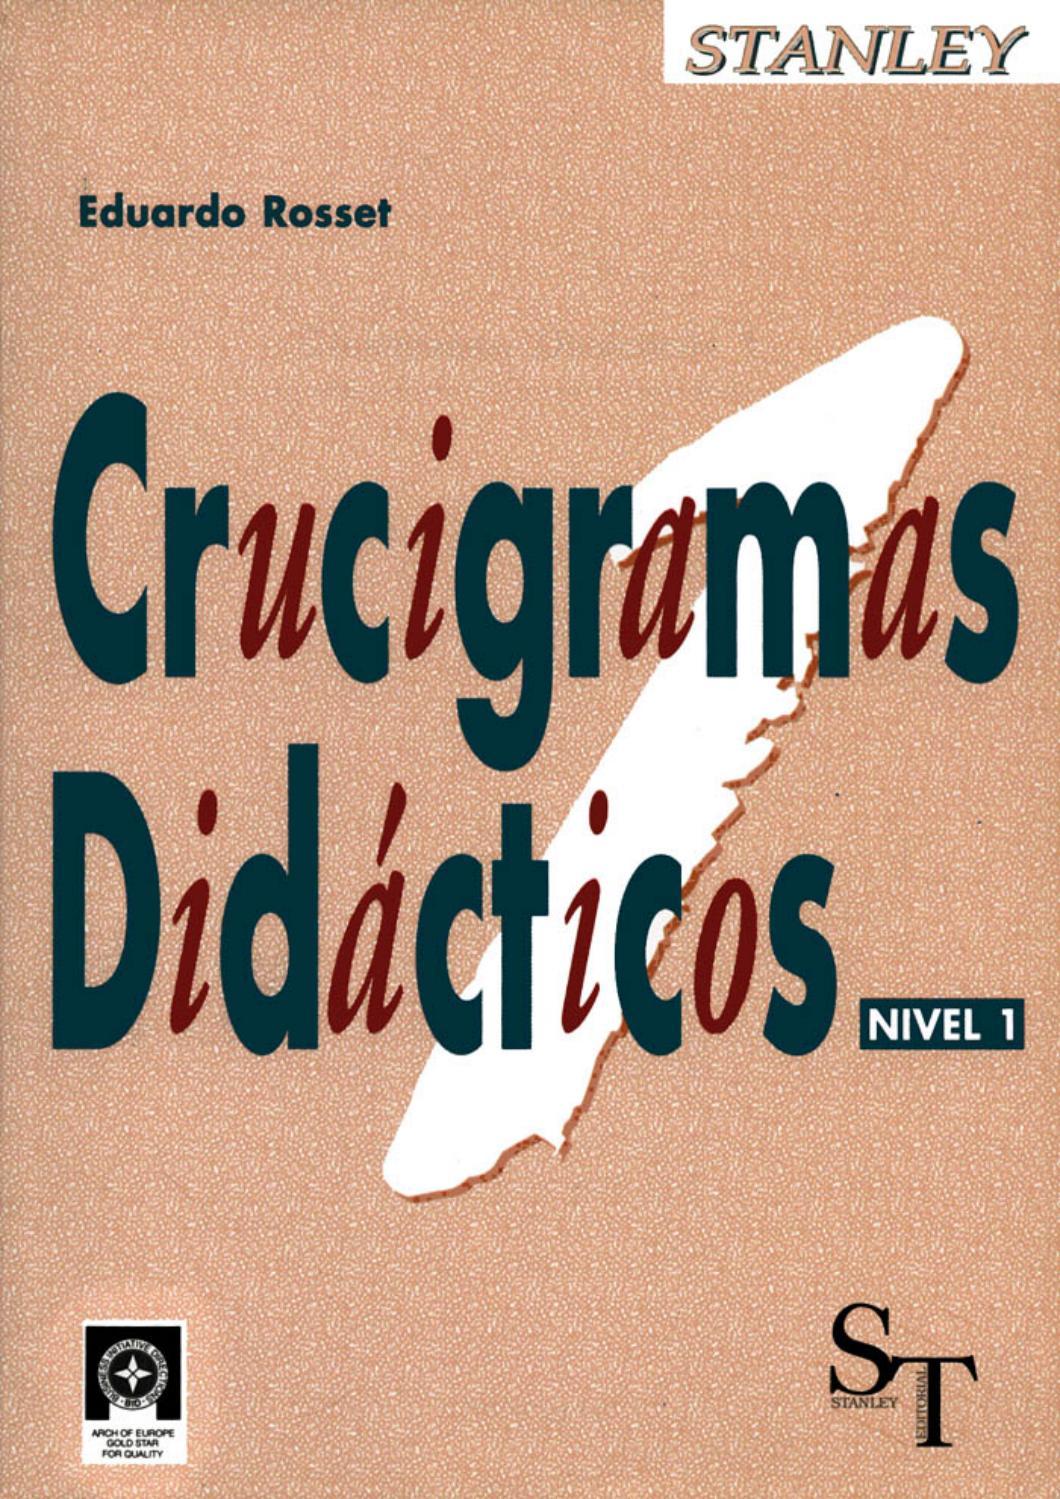 A2 crucigramas didácticos 1 (43 pag)x by Ana Maria Porto Lopez - issuu